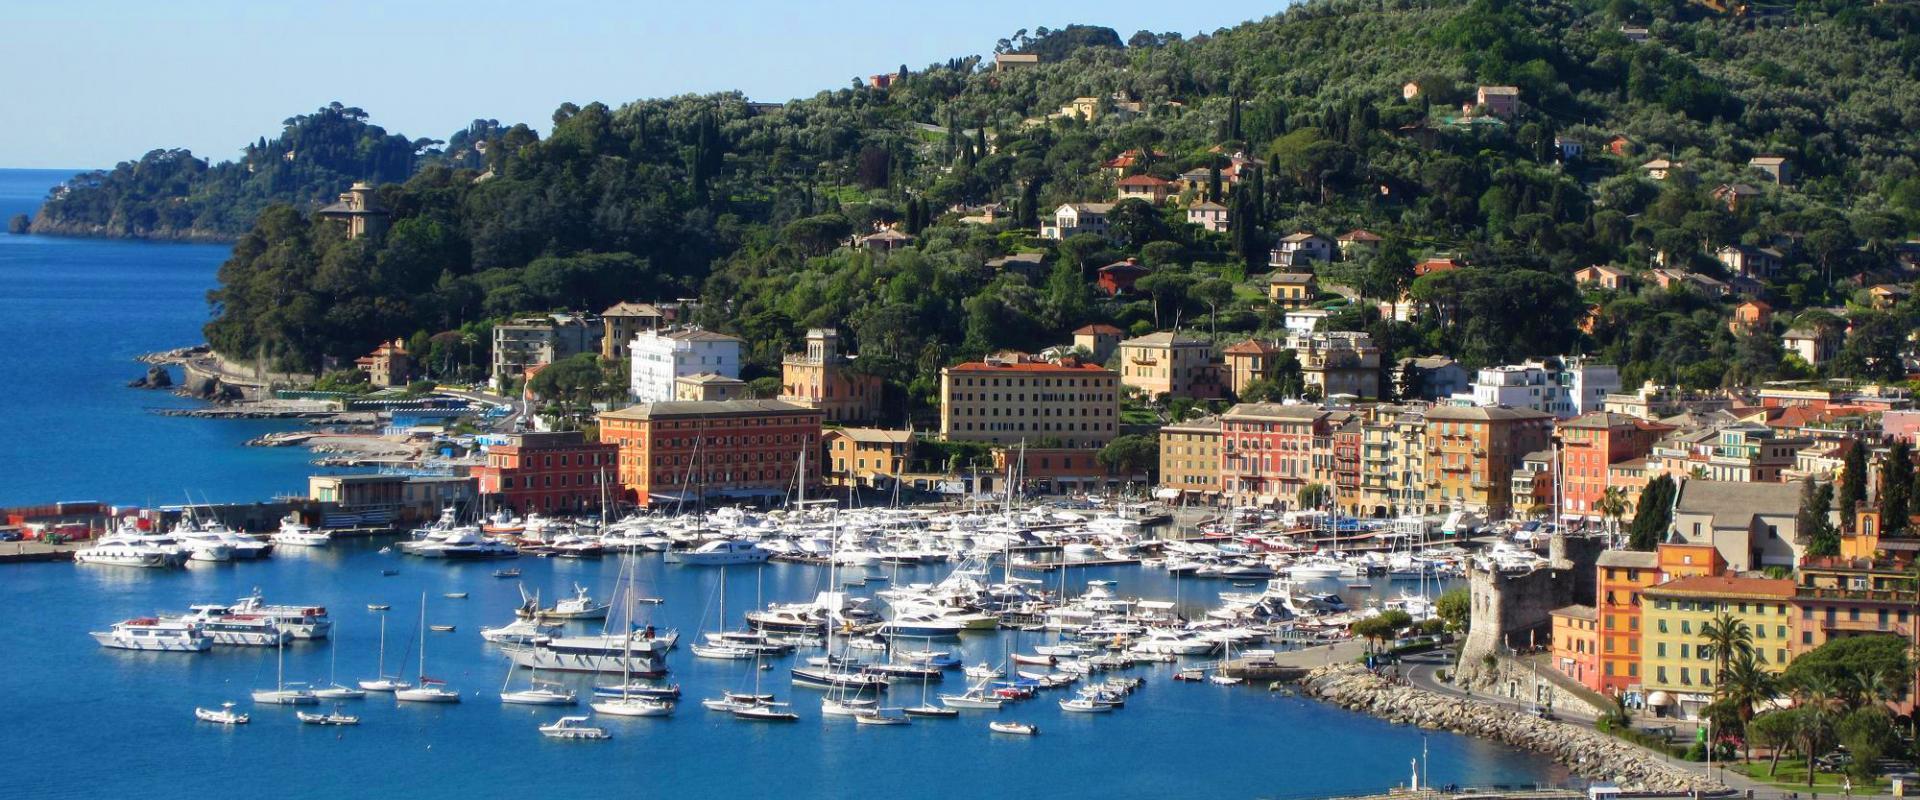 Guided tour of Santa Margherita Ligure